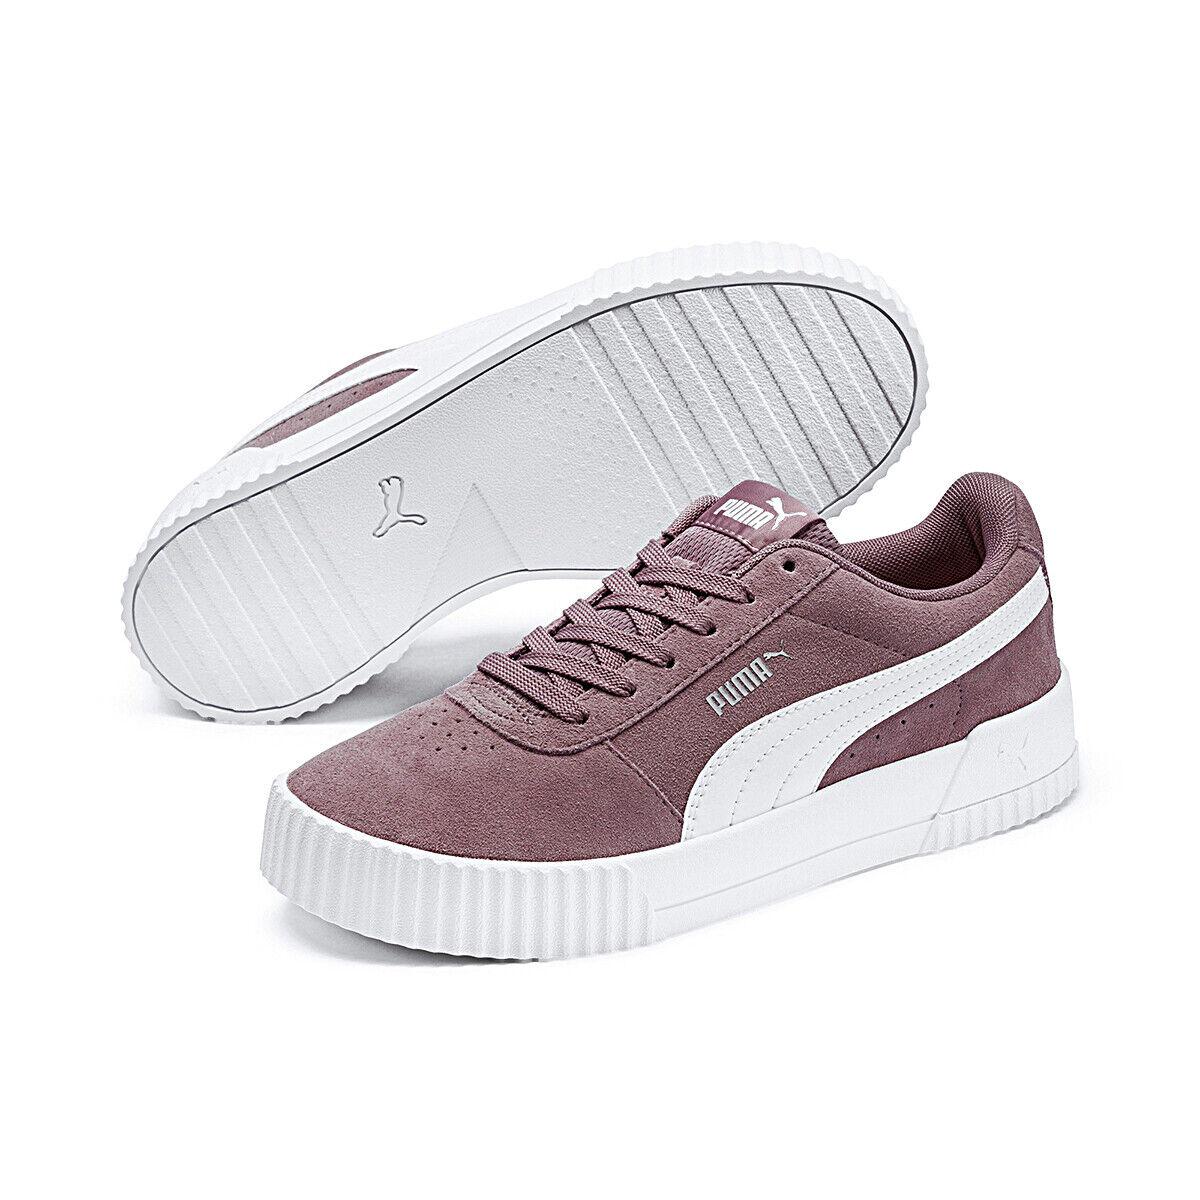 Puma Cabasag Women's Sneakers Suede shoes Suede